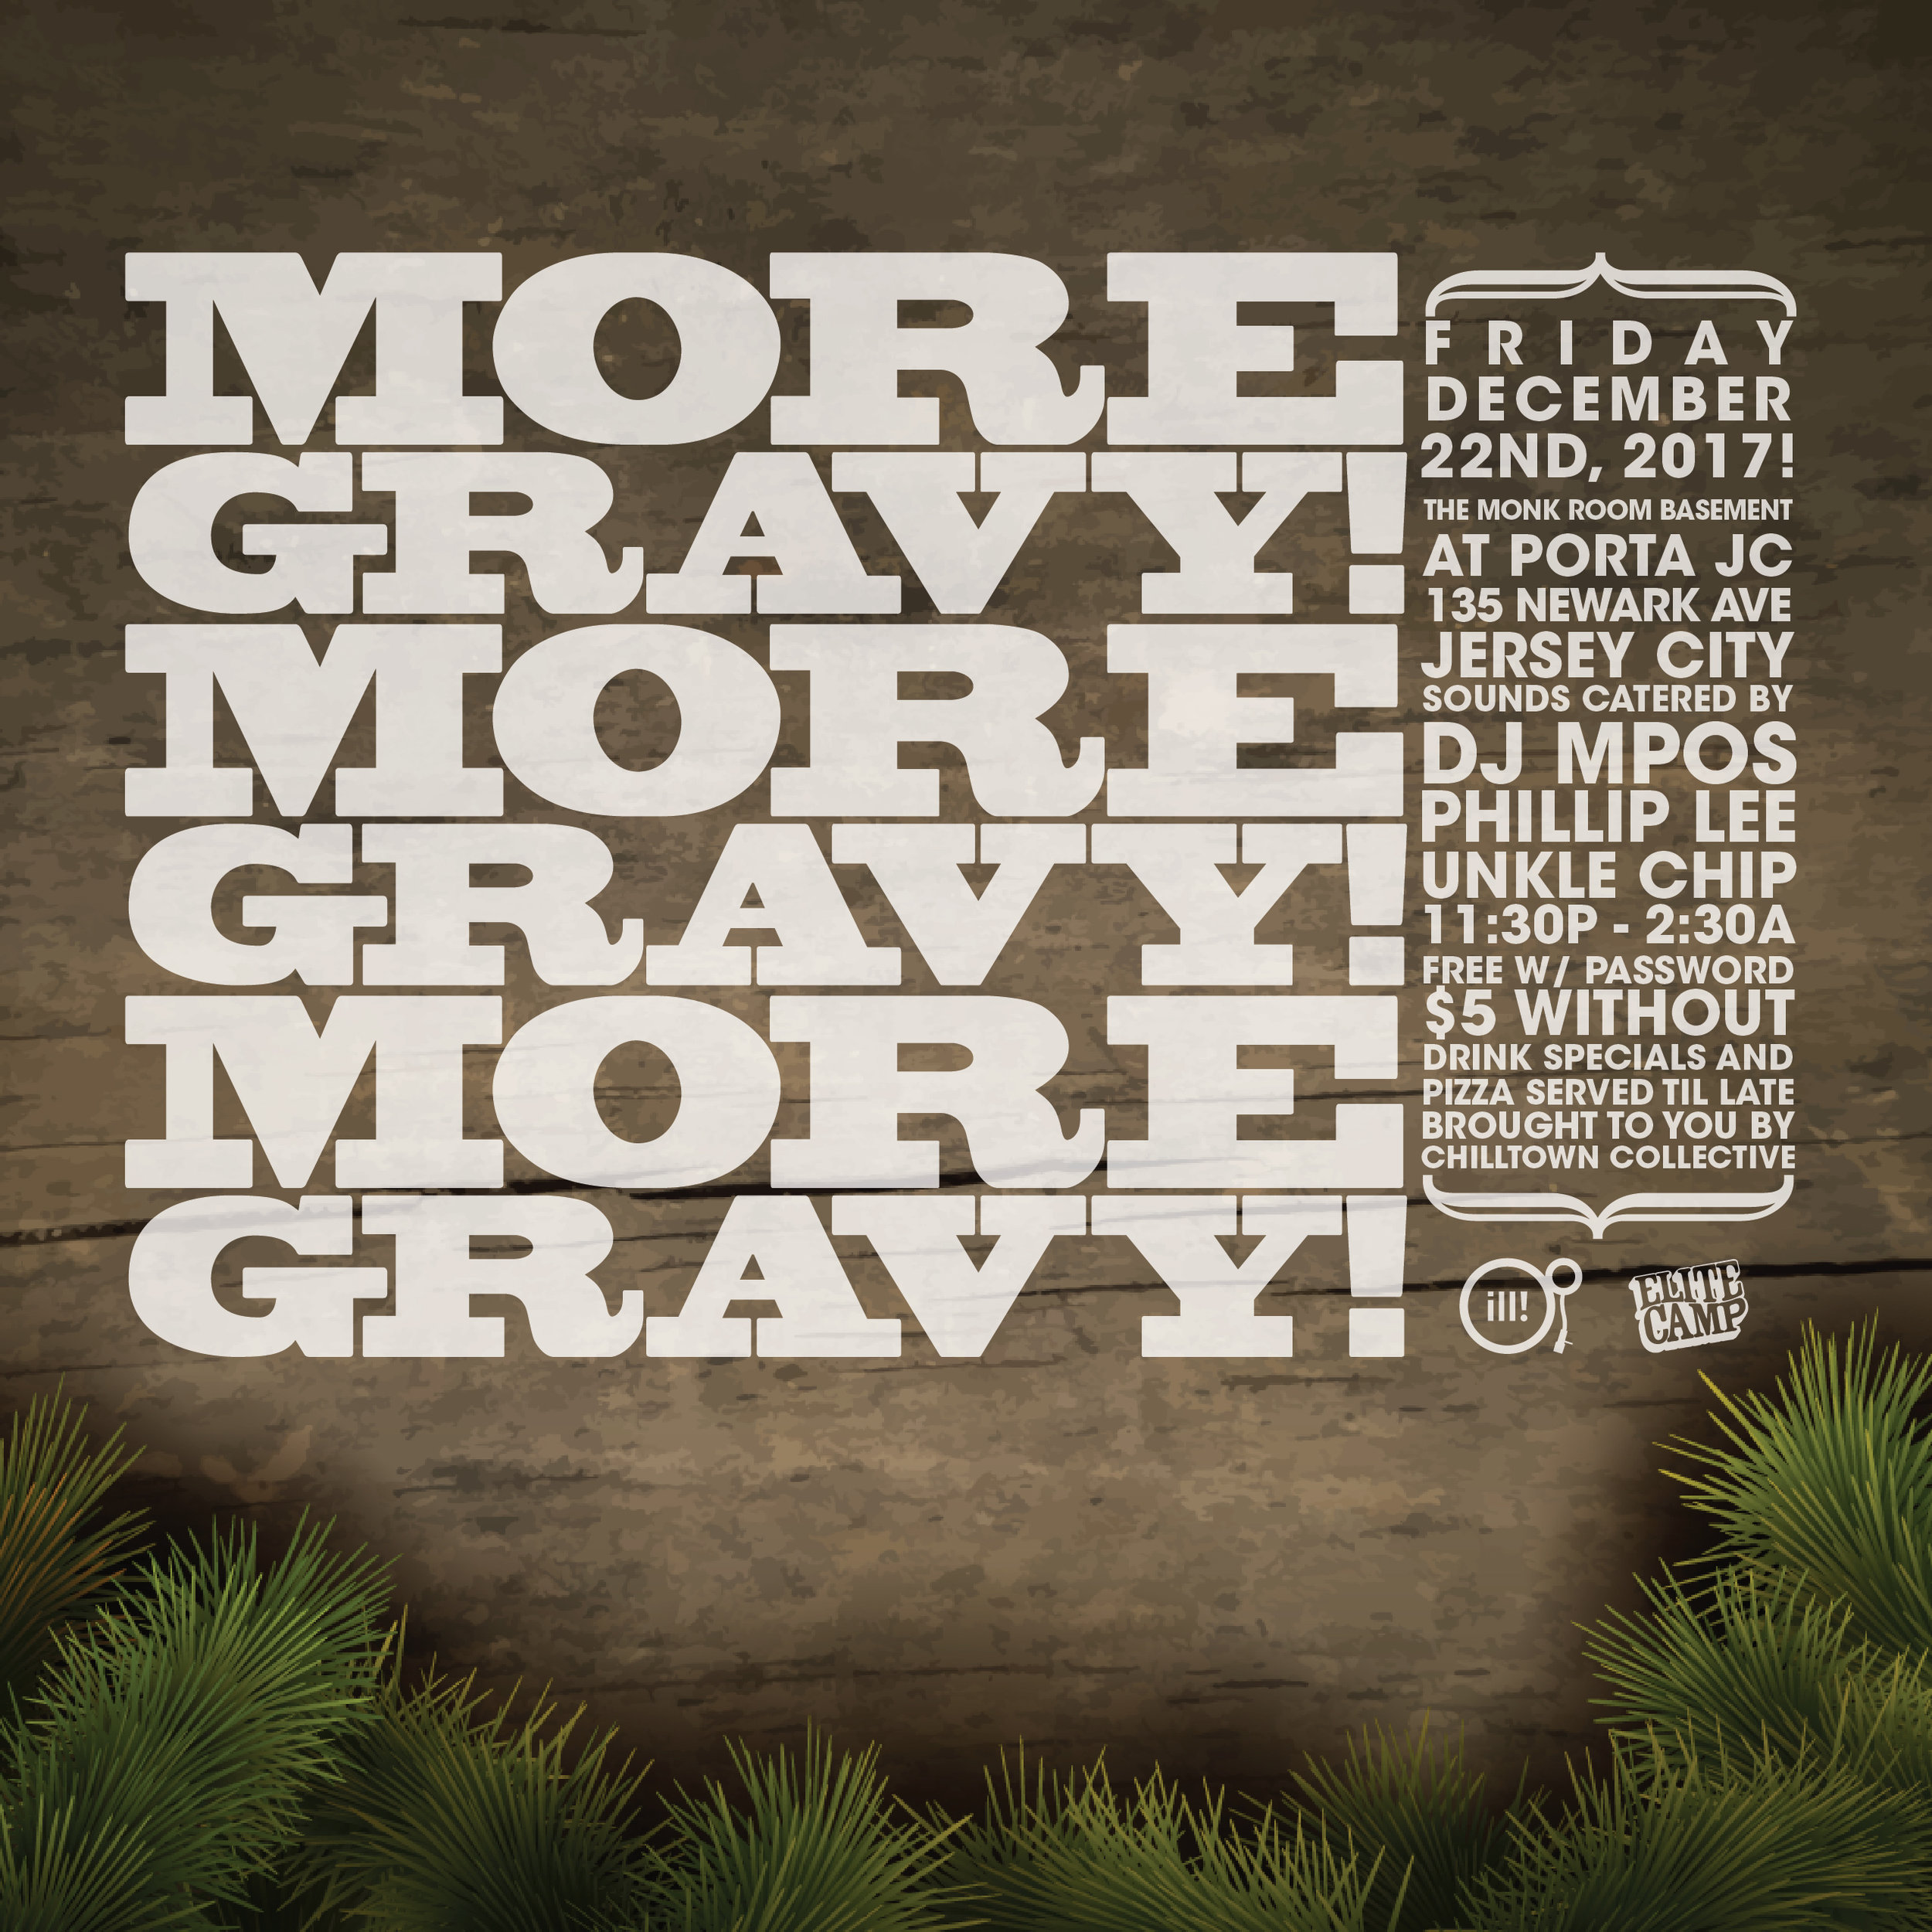 moregravy2017_REV_01_jpg..jpeg